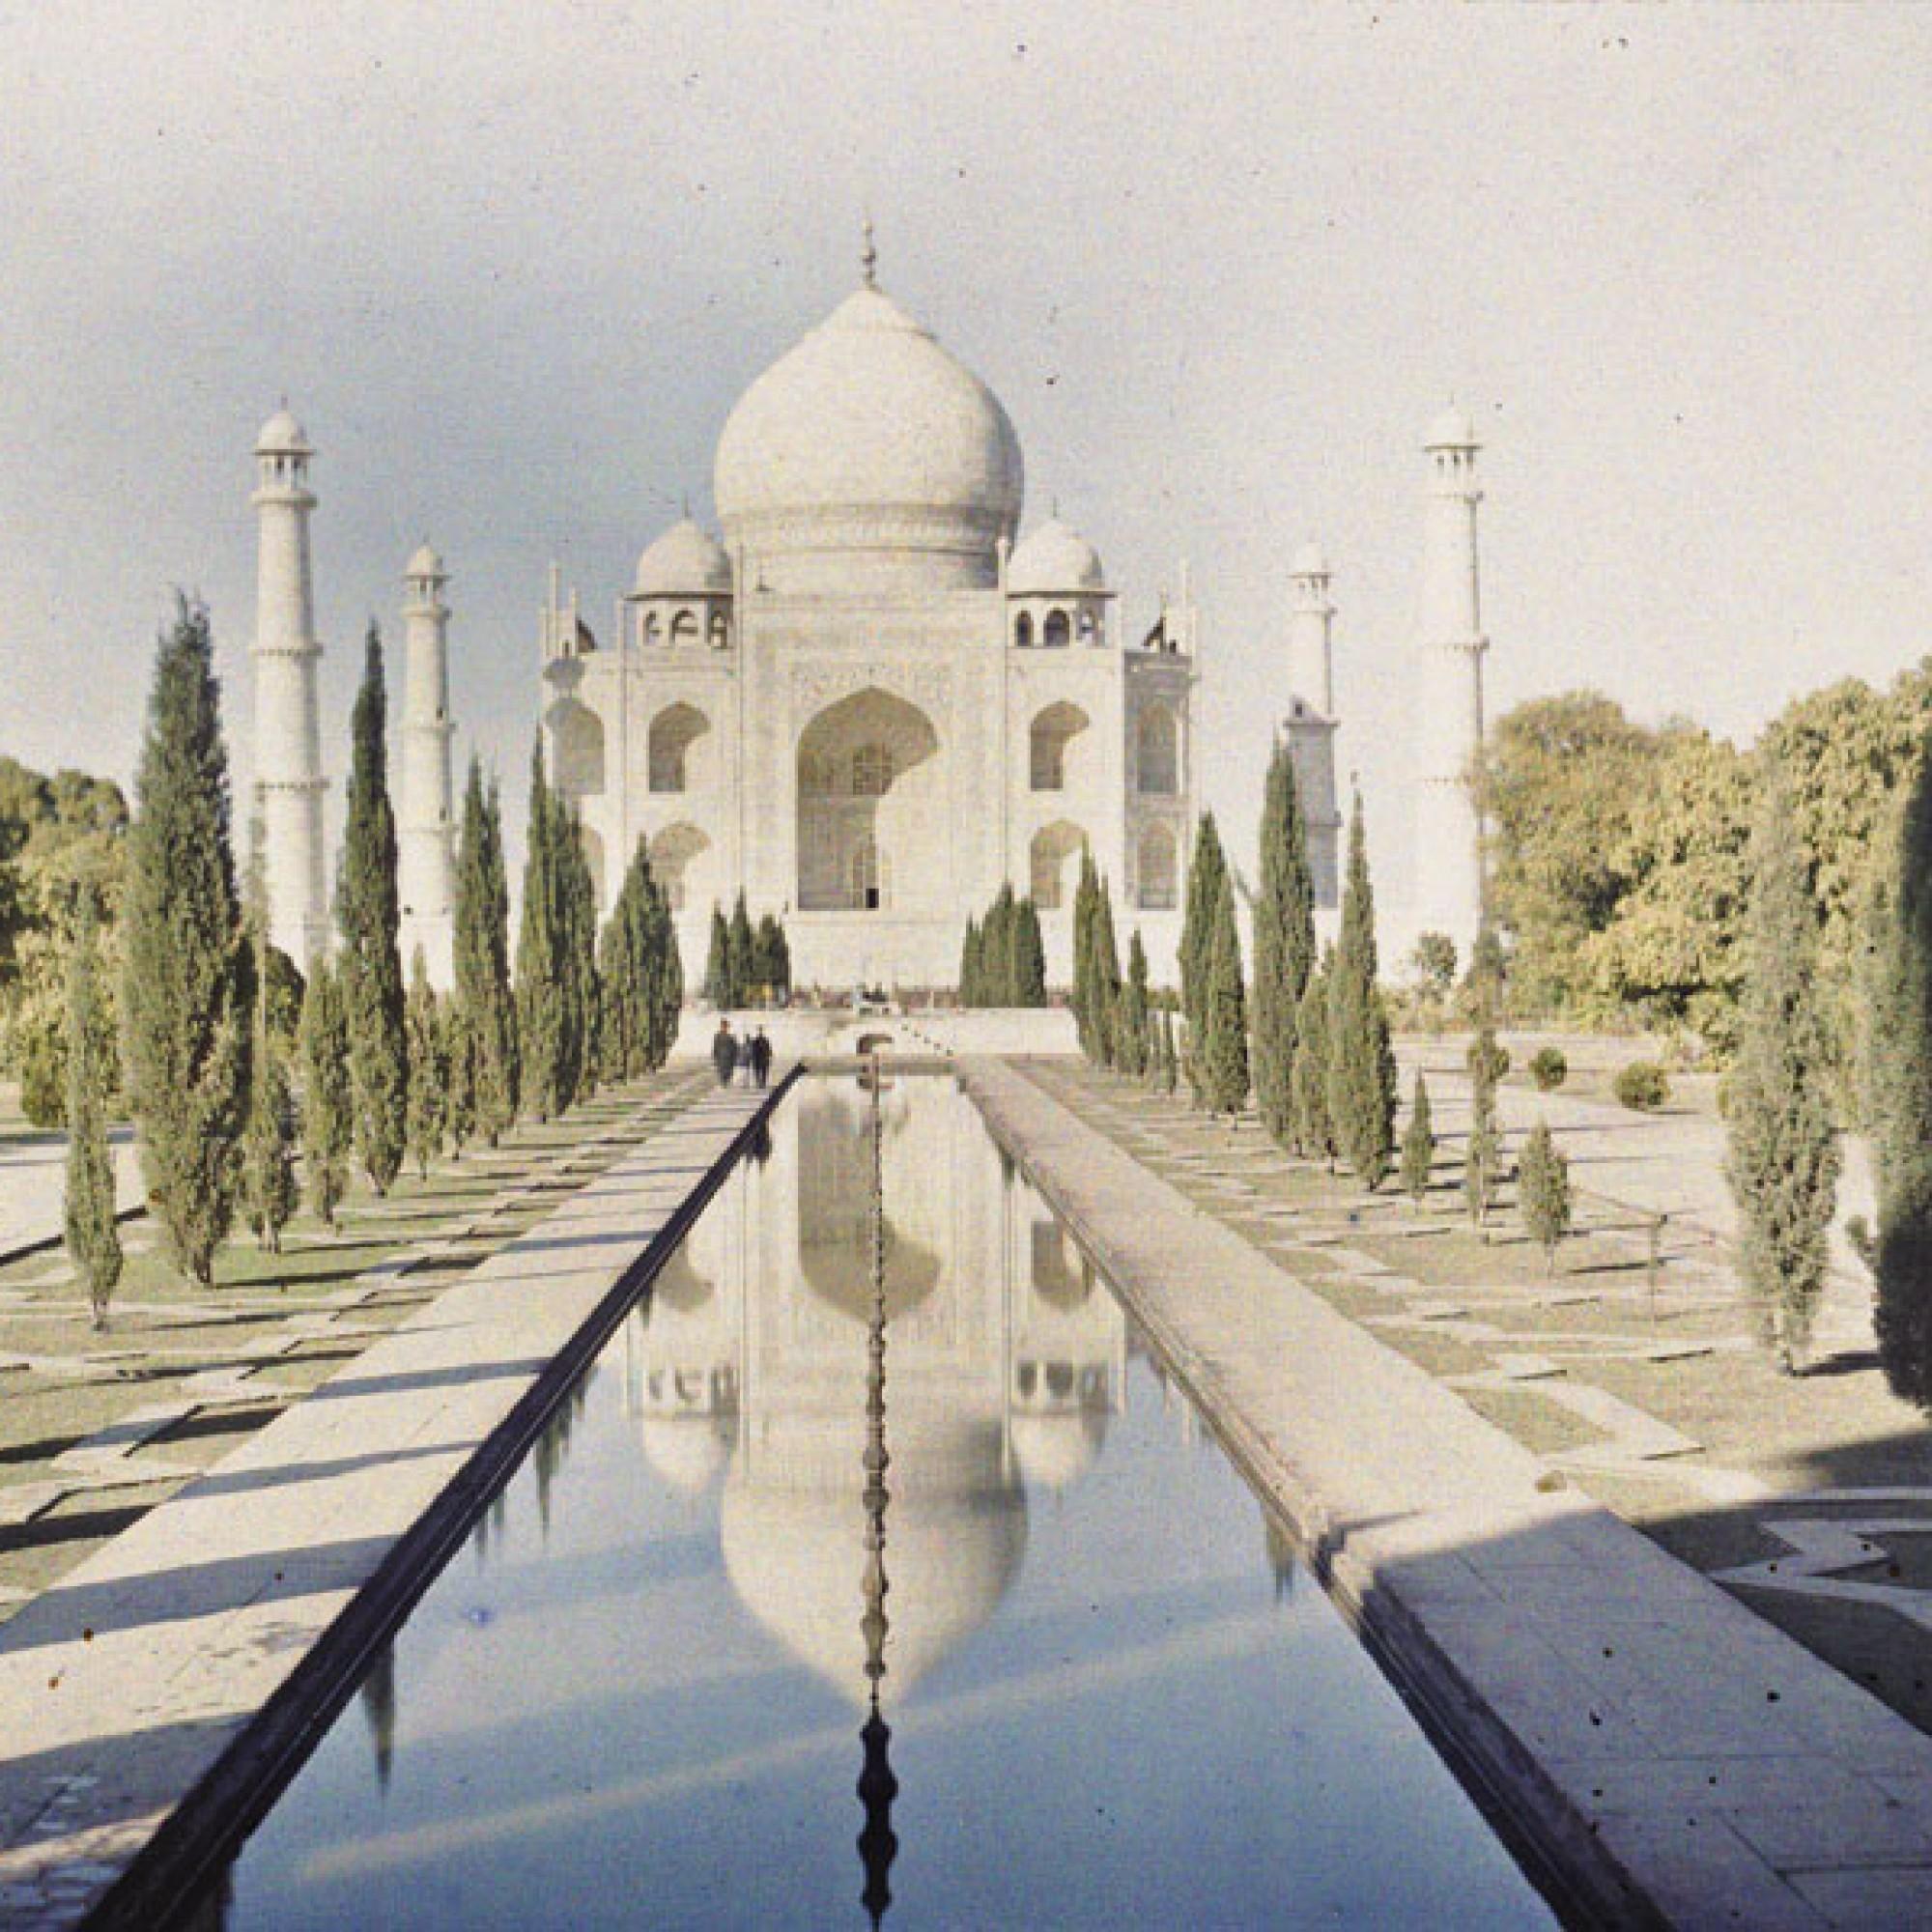 Stéphane Passet, Indien, Uttar Pradesh, Agra, Mausoleum Taj Mahal von Shah Jahan für Mumtaz Mahal , 19.-21. Januar 1914.  (Musée Albert-Kahn, Département des Hauts-de-Seine)